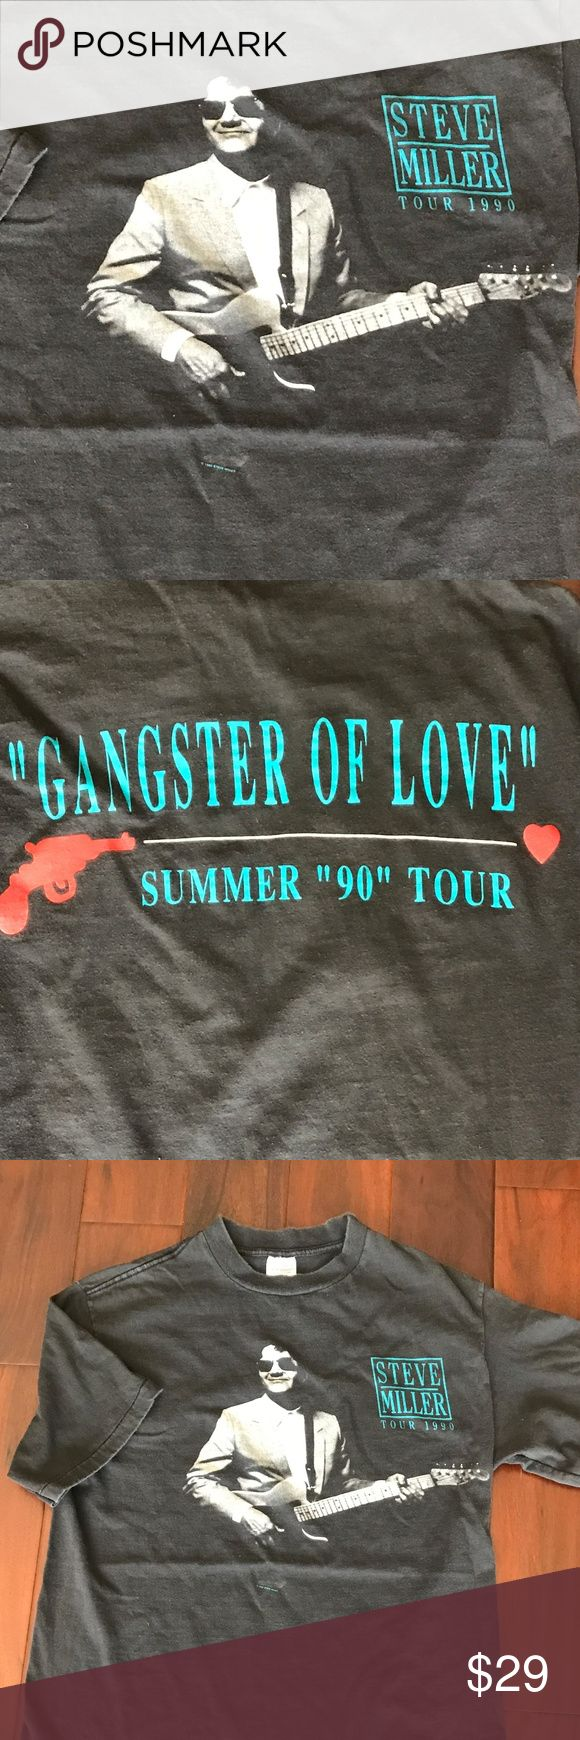 "Steve Miller Gangster of Love Concert Tee Cool vintage concert tshirt.  Steve Miller Band Gangster of Love Tour - 1990  Black.  100% cotton.  Short Sleeve.  Does have faded and a bit of pilling.  Armpit to armpit = 20.5"".  Length = 27"".  Shoulder to shoulder = 18"". Gurney Shirts Tees - Short Sleeve"